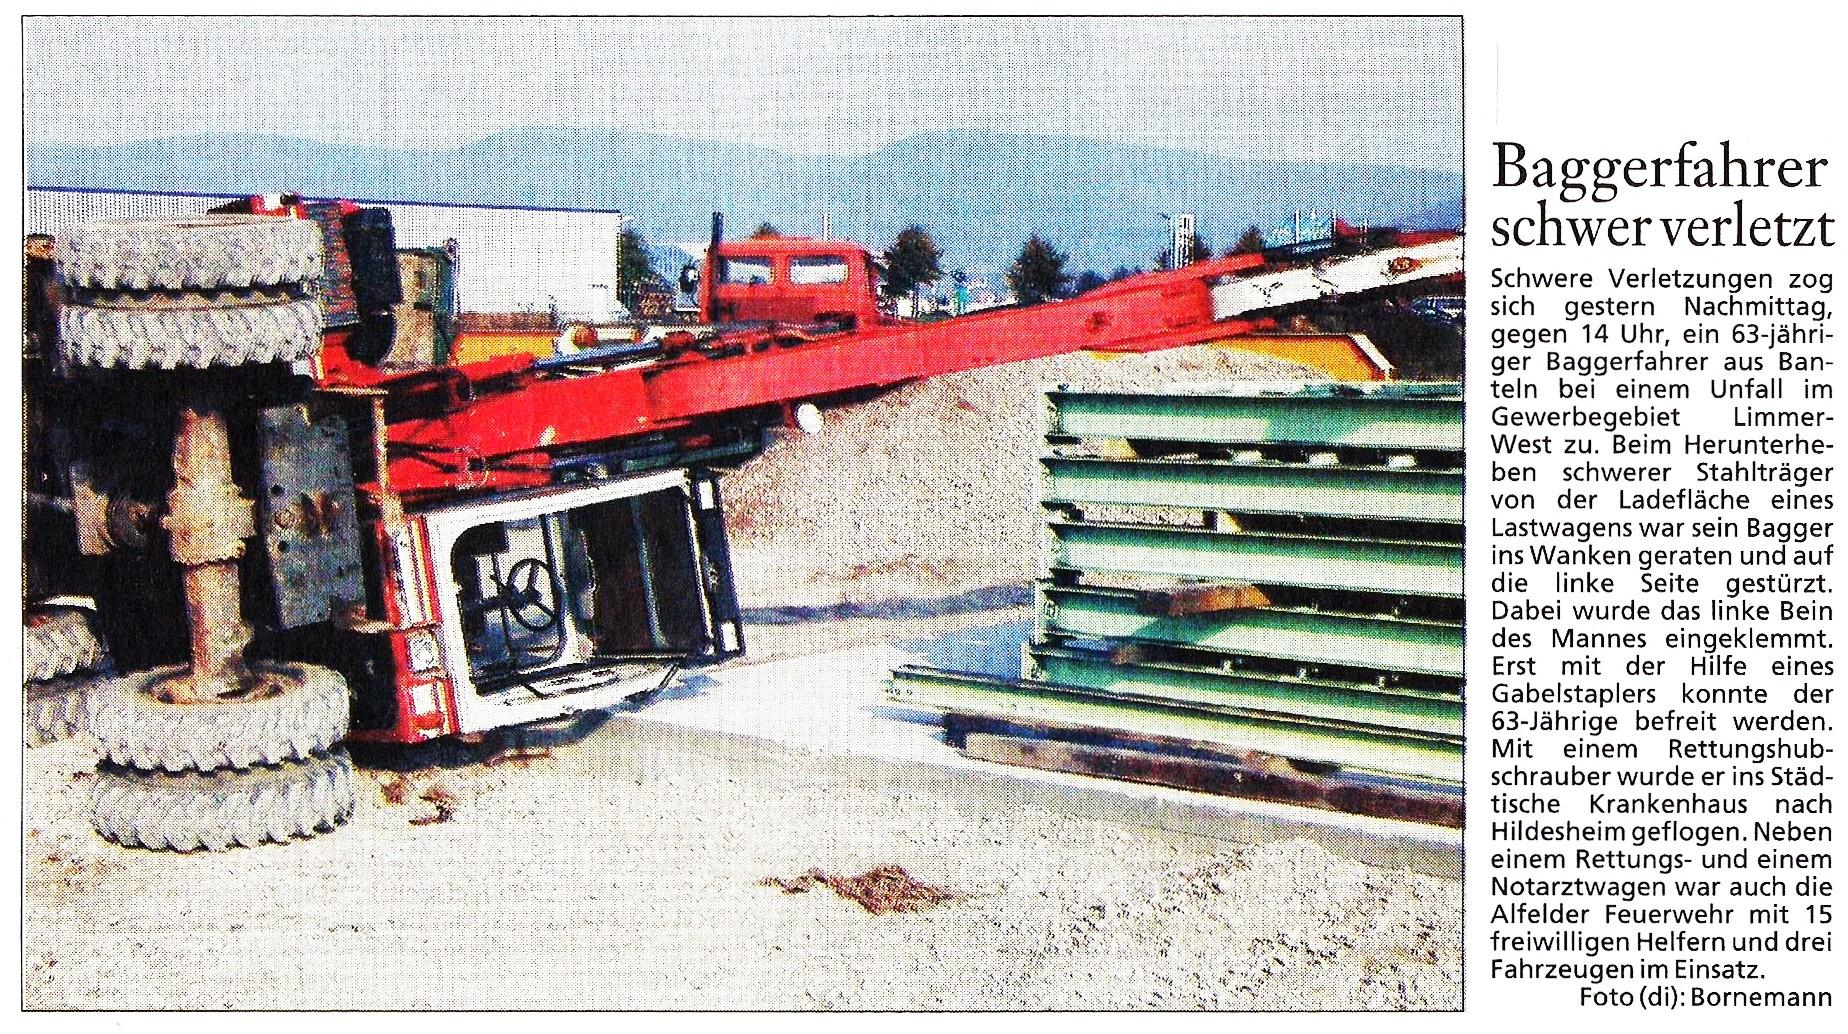 2001-10-19 Baggerfahrer schwer verletzt